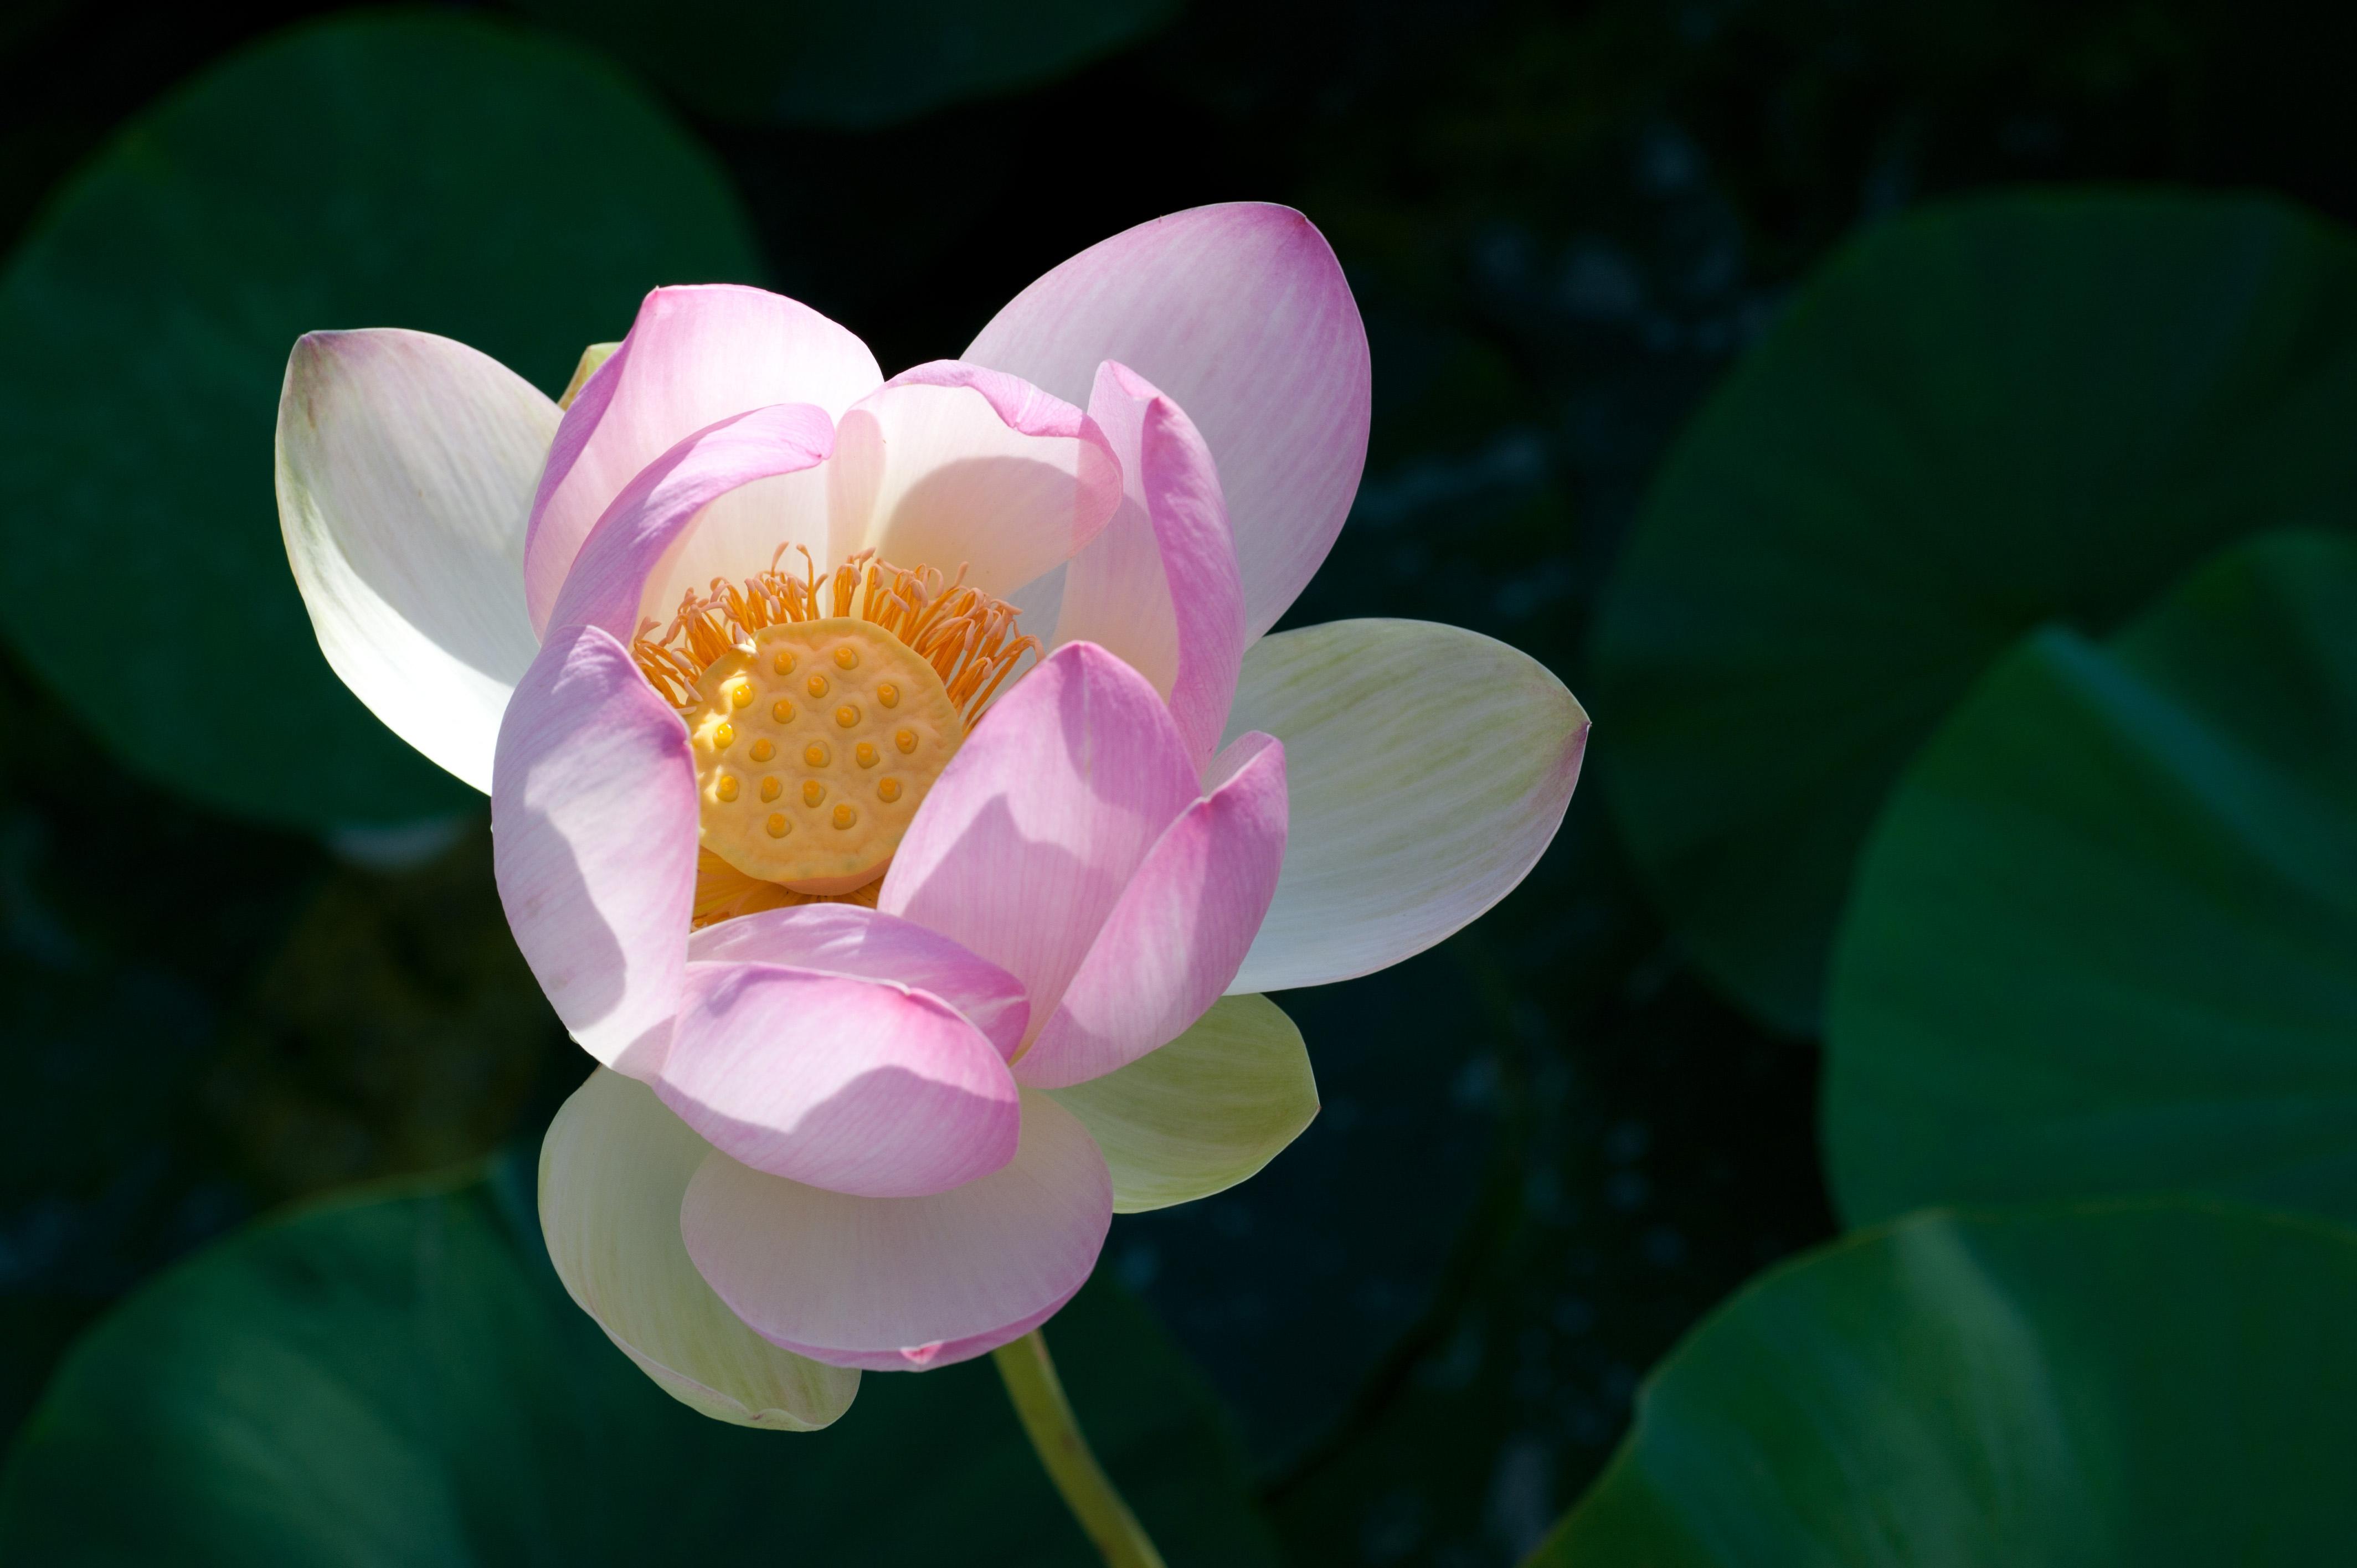 Flower Lotus Nature Macro Fine Picturesque Picturesboss